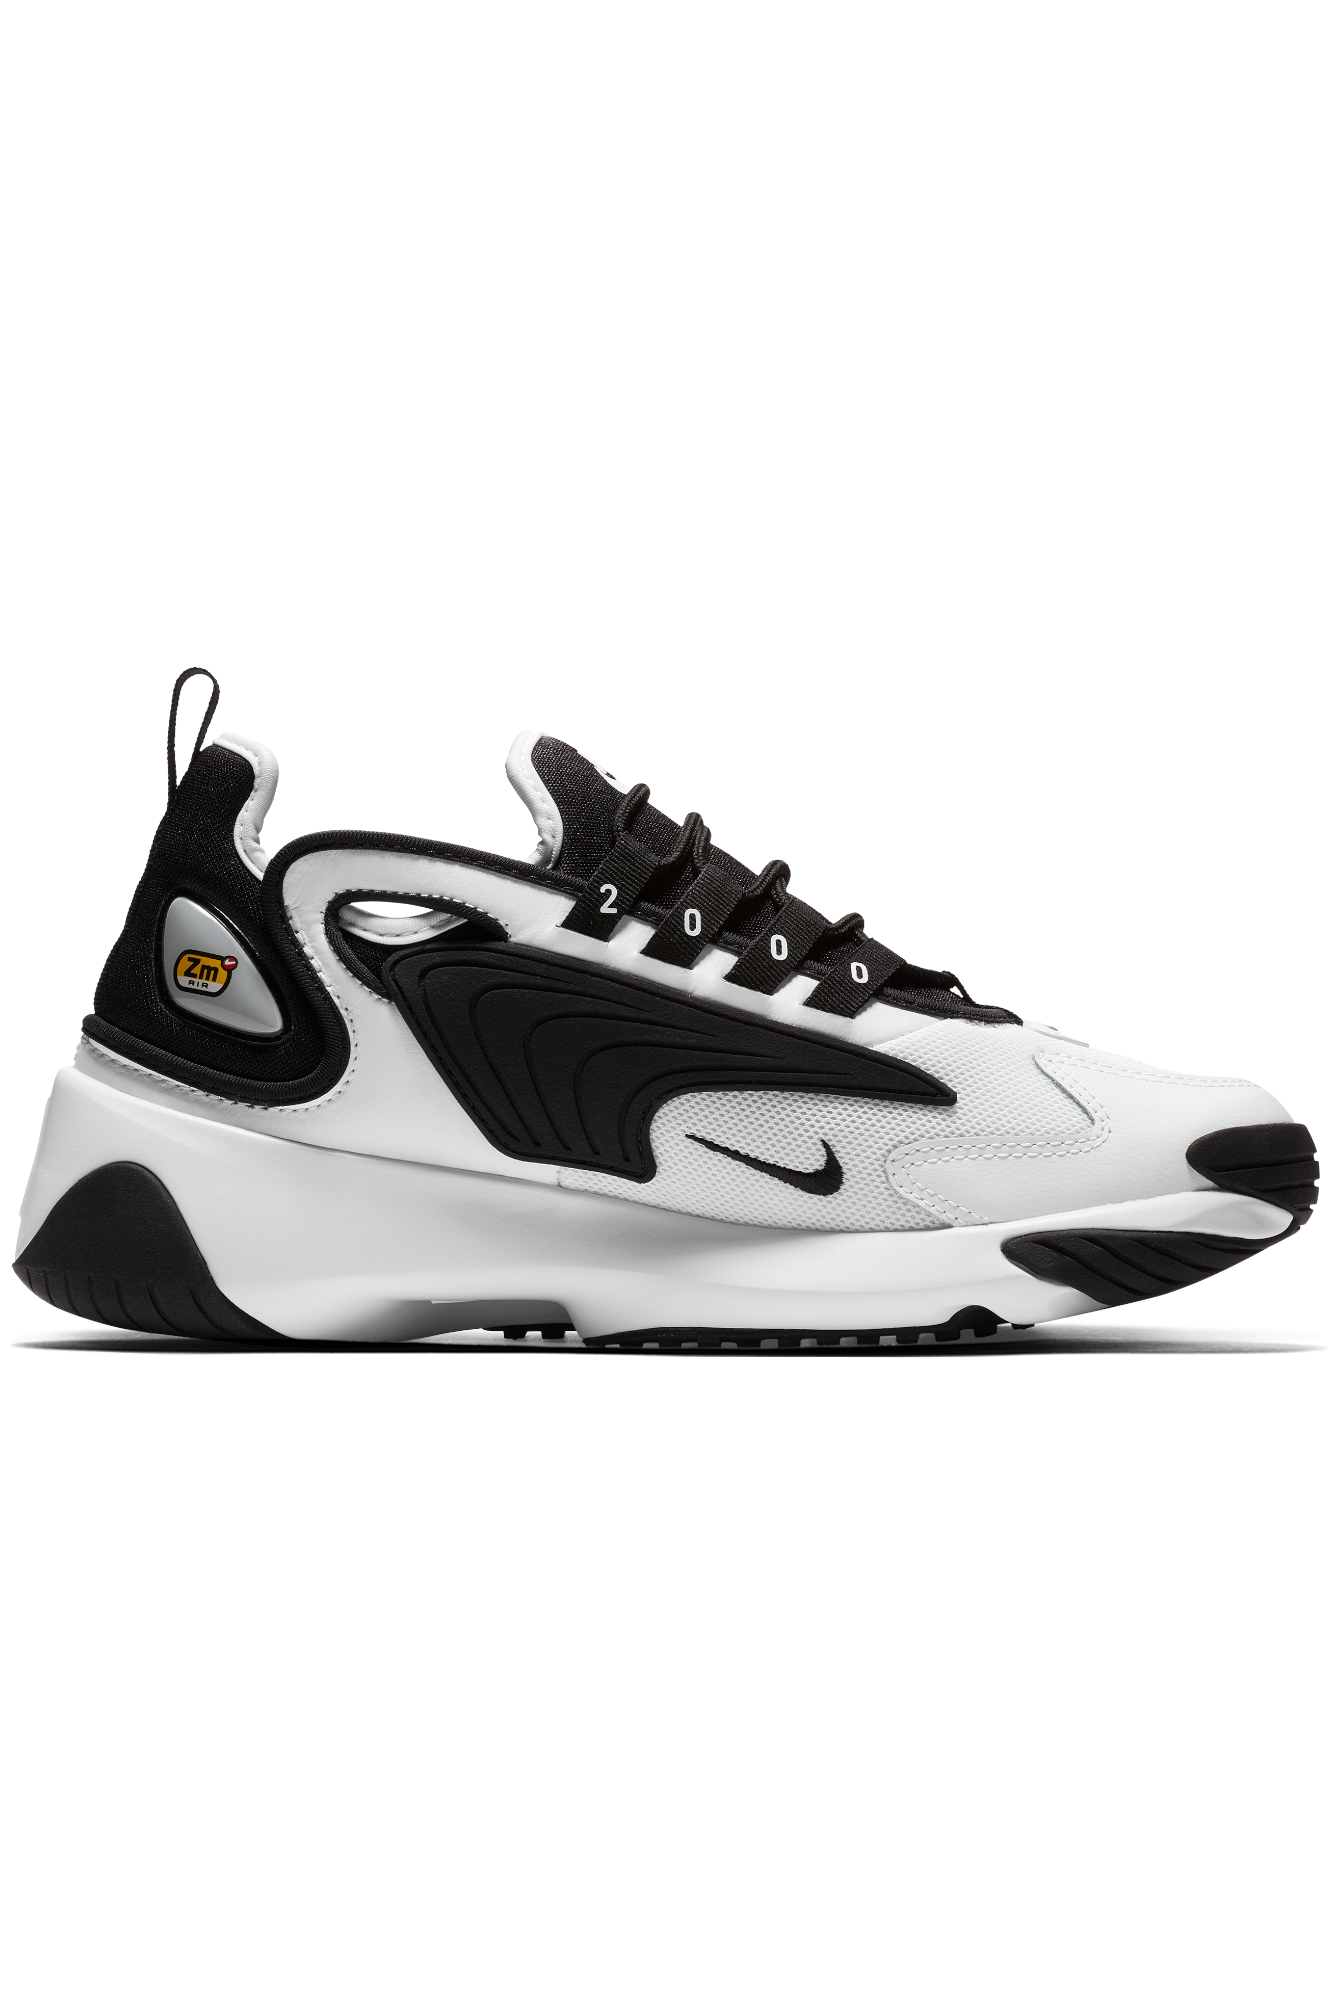 Buty Nike Zoom 2K AO0354 100 Na co dzień Buty